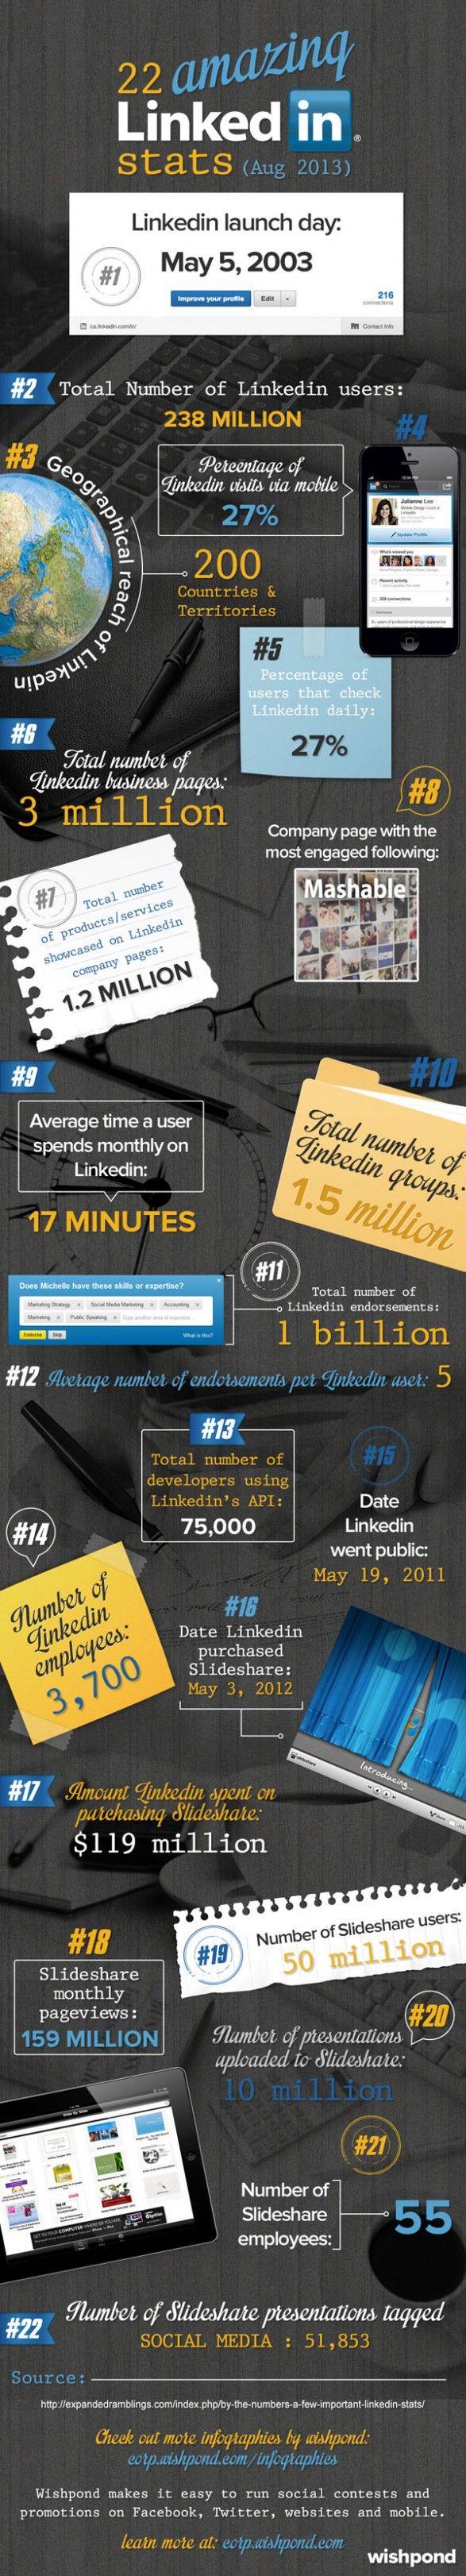 22 Amazing LinkedIn Stats infographic 149 best